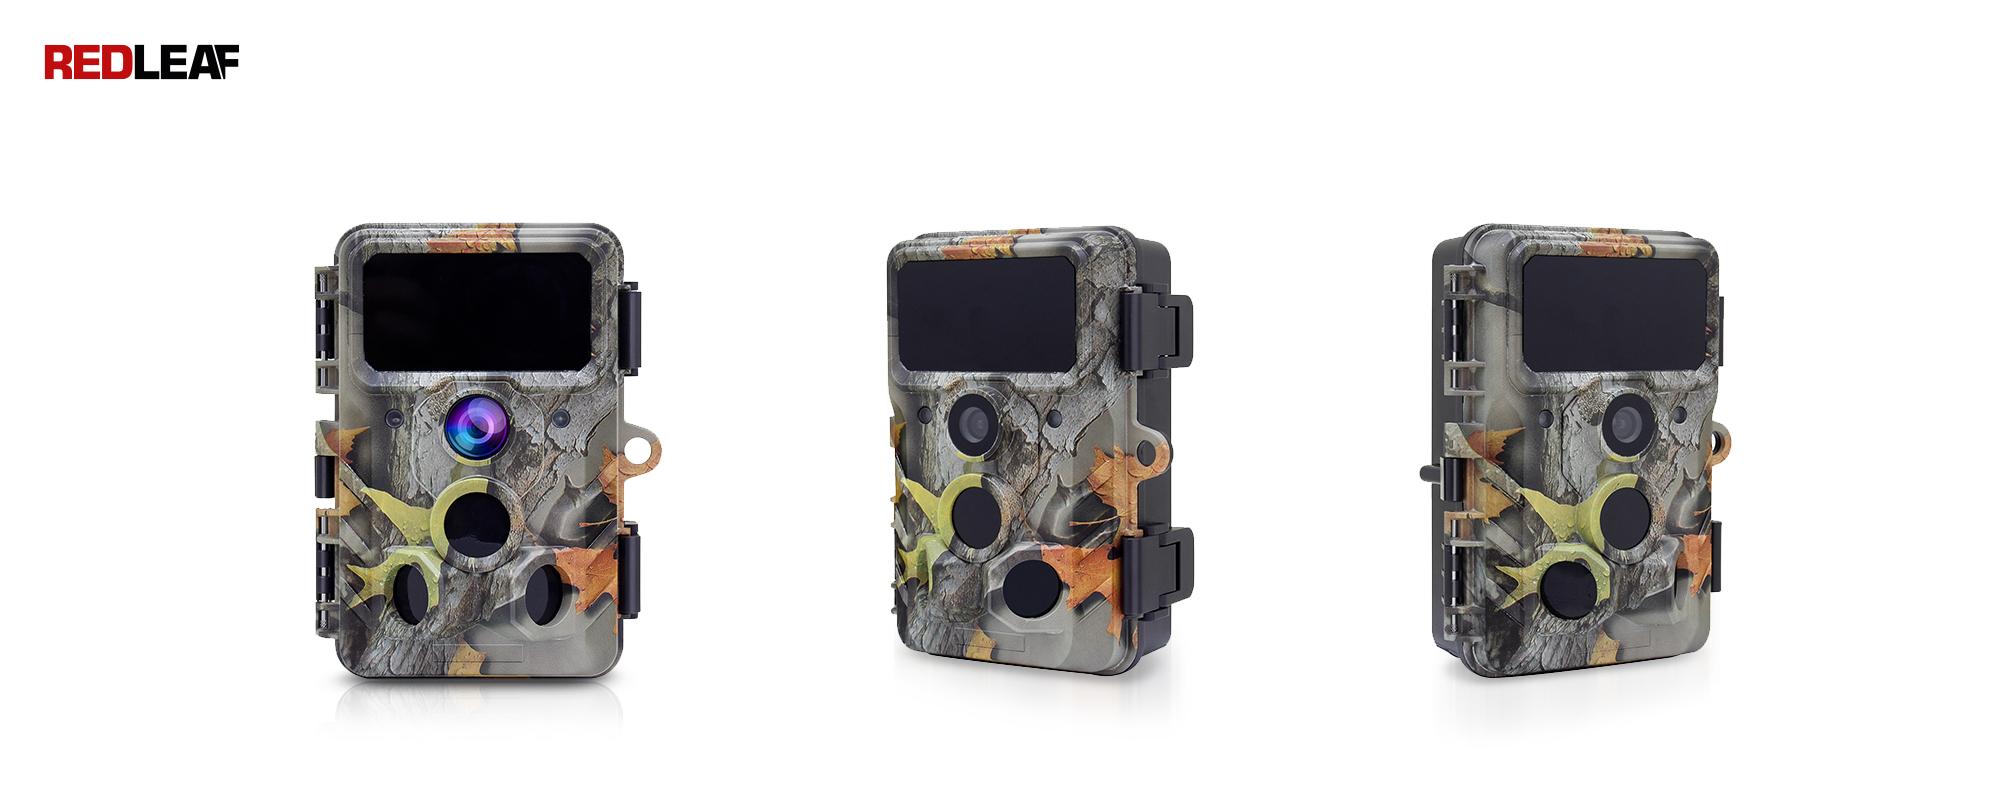 Redleaf RD3019 Pro front side and diagonal surveillance camera